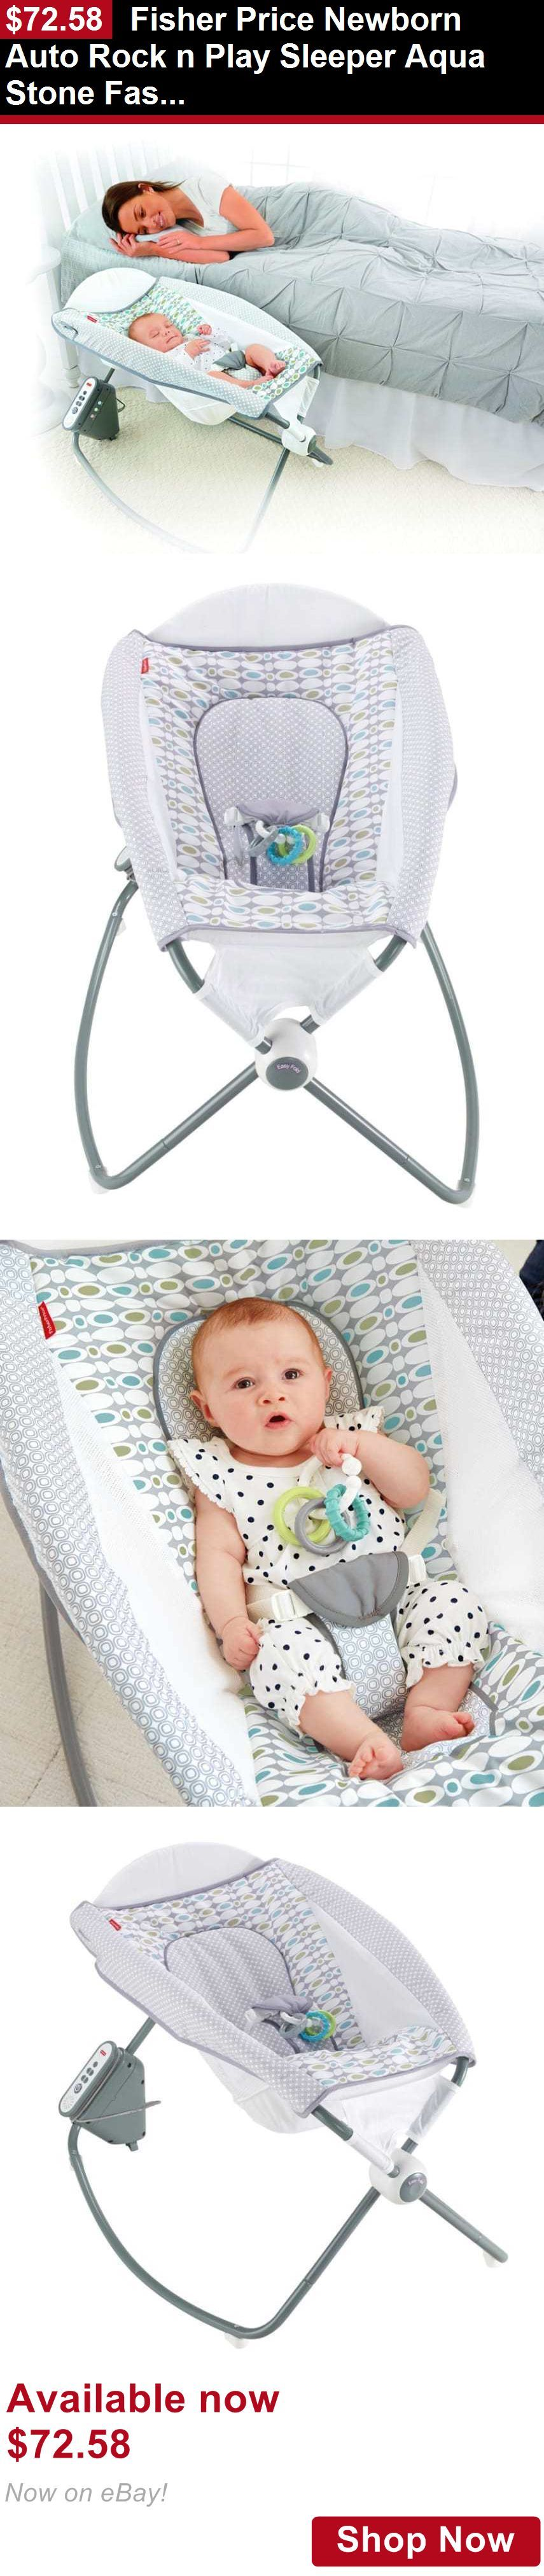 burlington baby play and rock safety newborn pin coat activity swings n sleeper